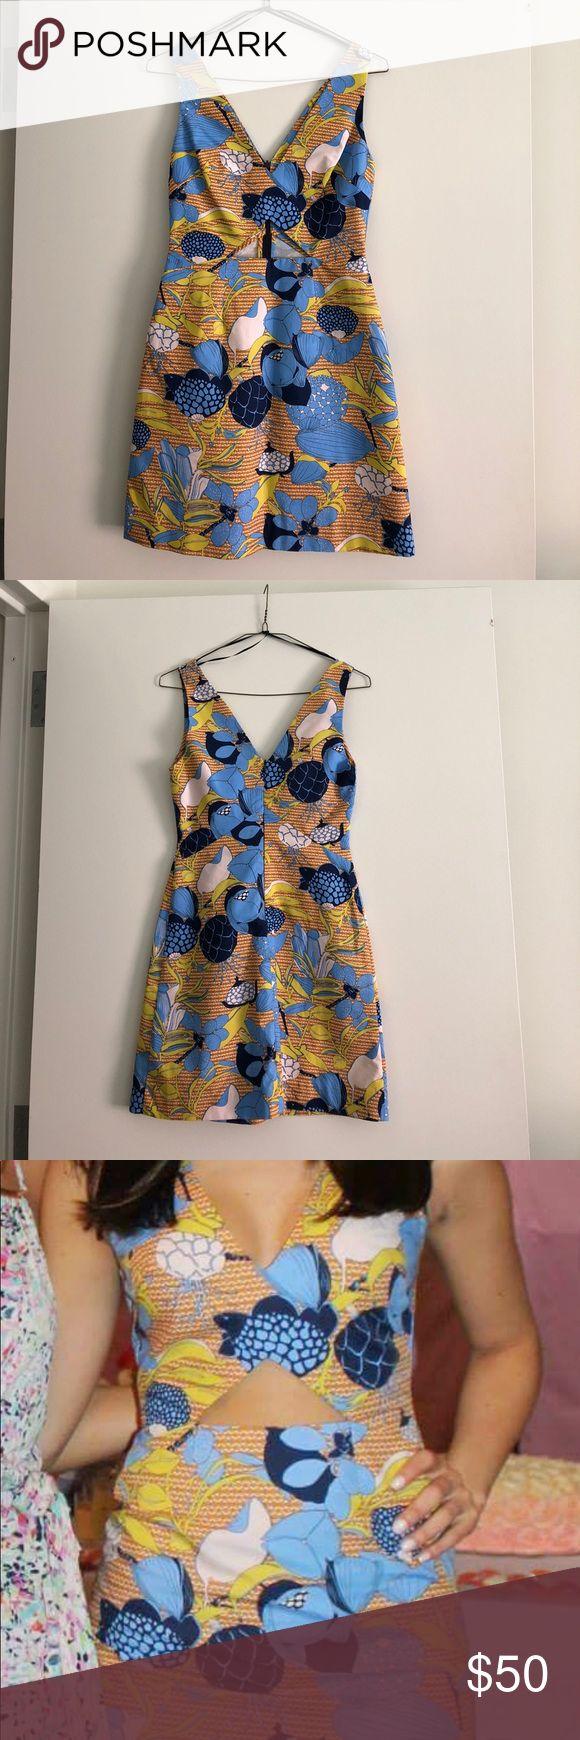 Mini Zara dress Zara dress size 0 Zara Dresses Mini